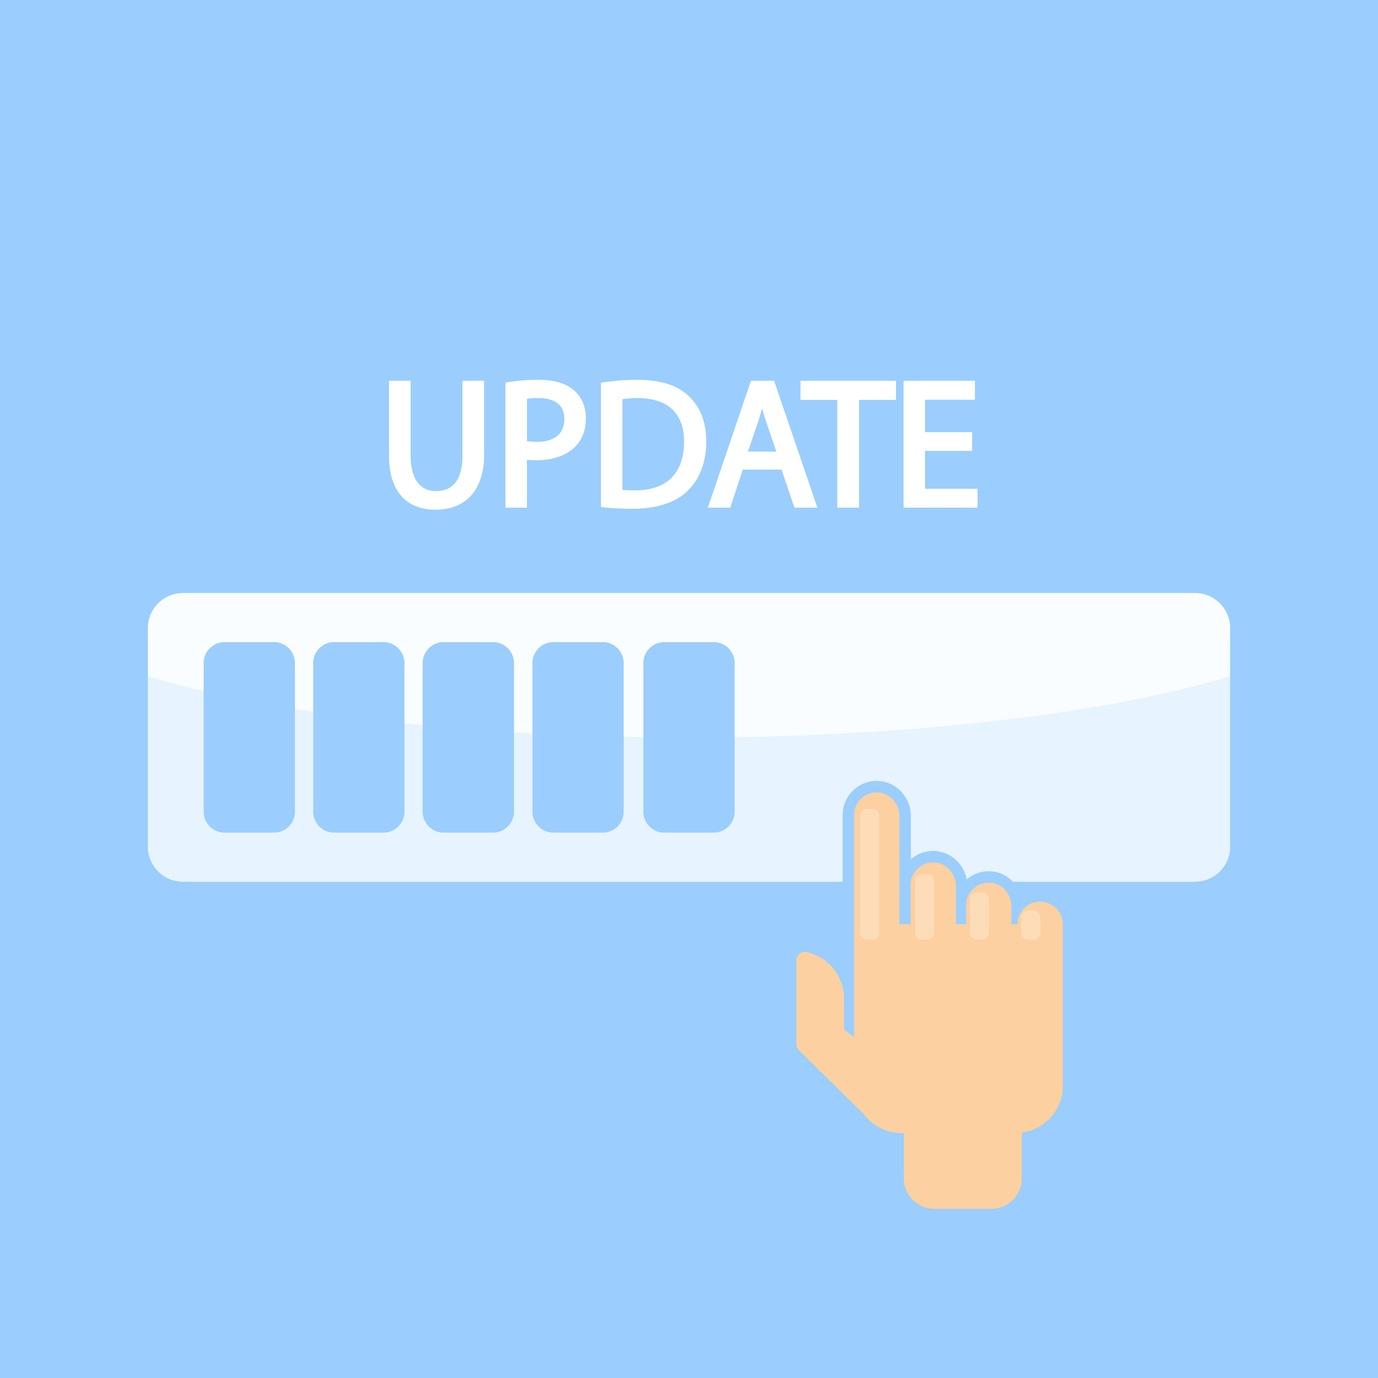 PBCS and EPBCS Updates (November 2017): Changes to the